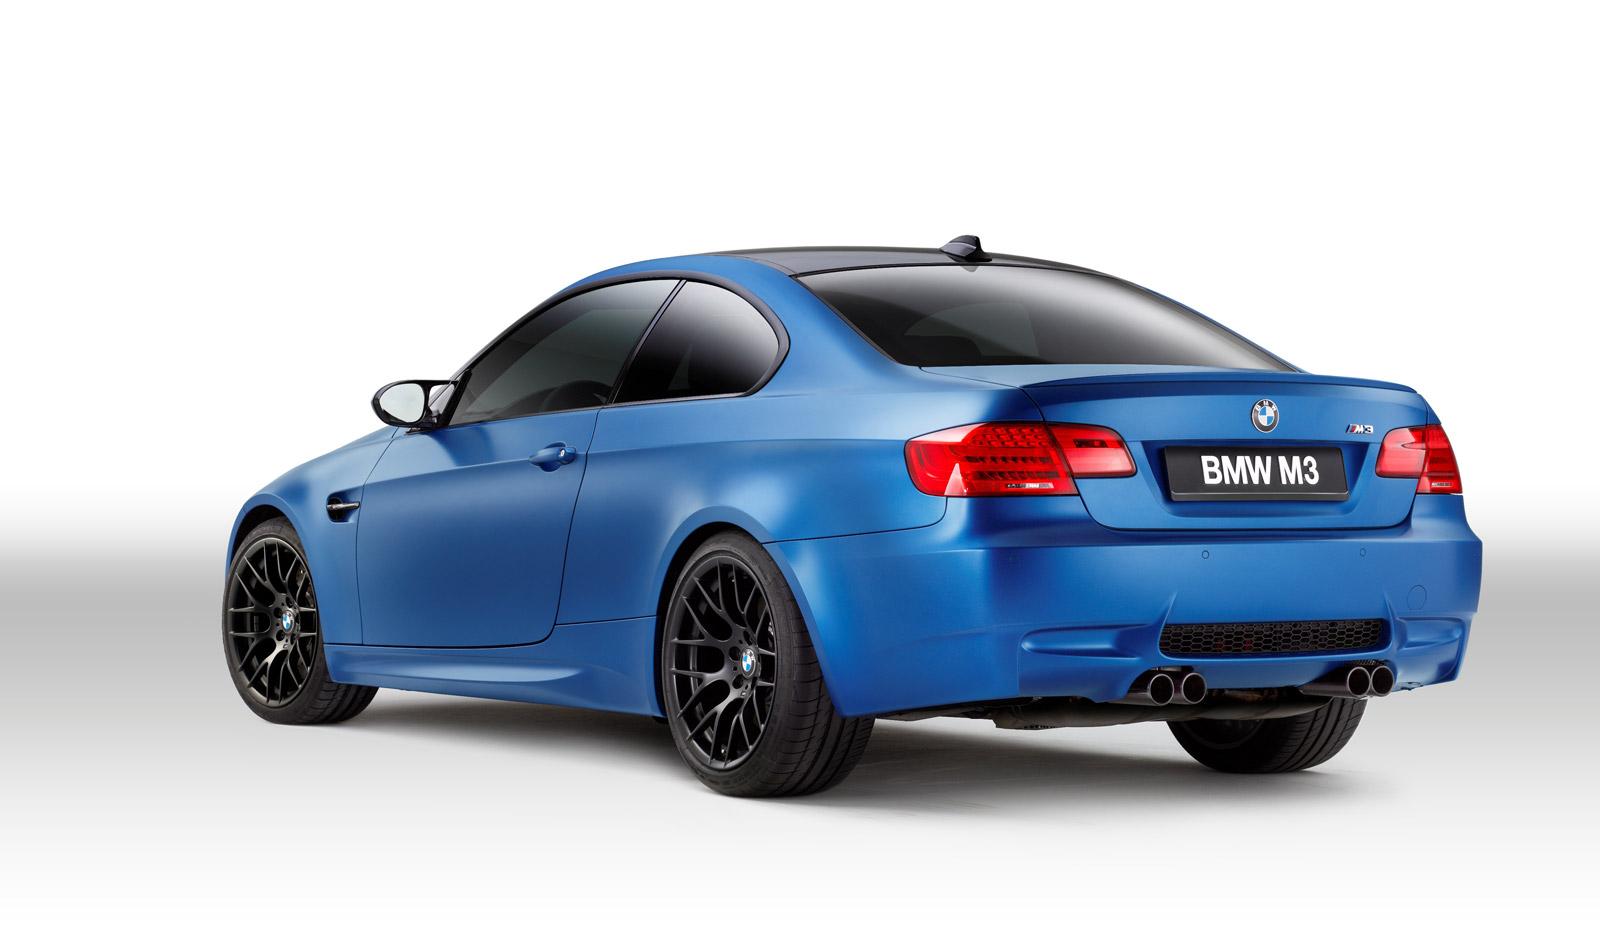 Aston Martin Vanquish Wallpaper 2013 Blue 2013 BMW M3 Coupe Froz...